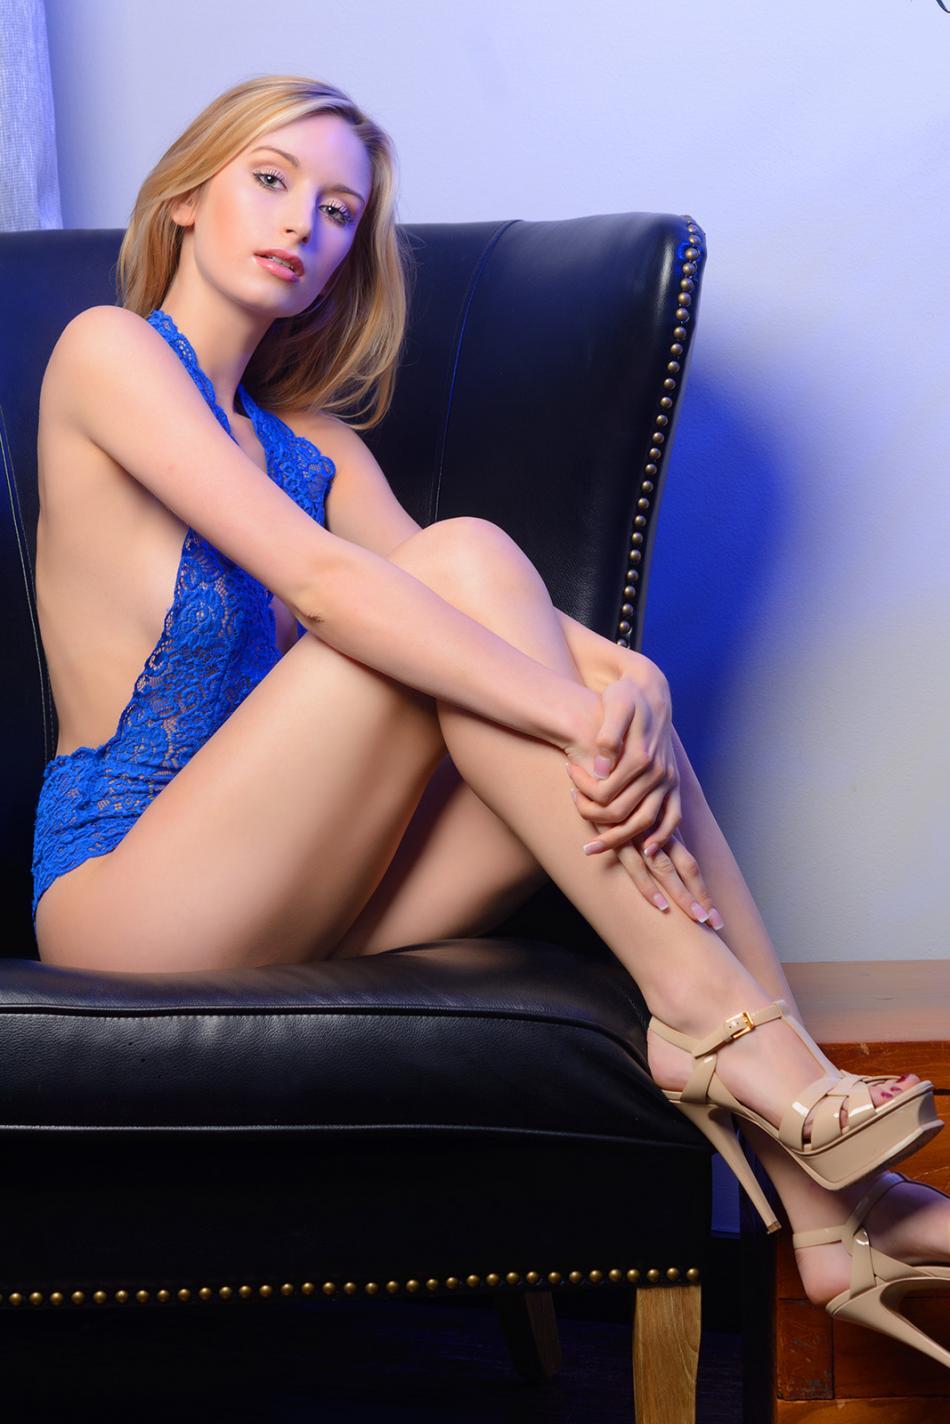 Ladyfordaddy.com Claudia Girl In New York 11083730 - 4 4